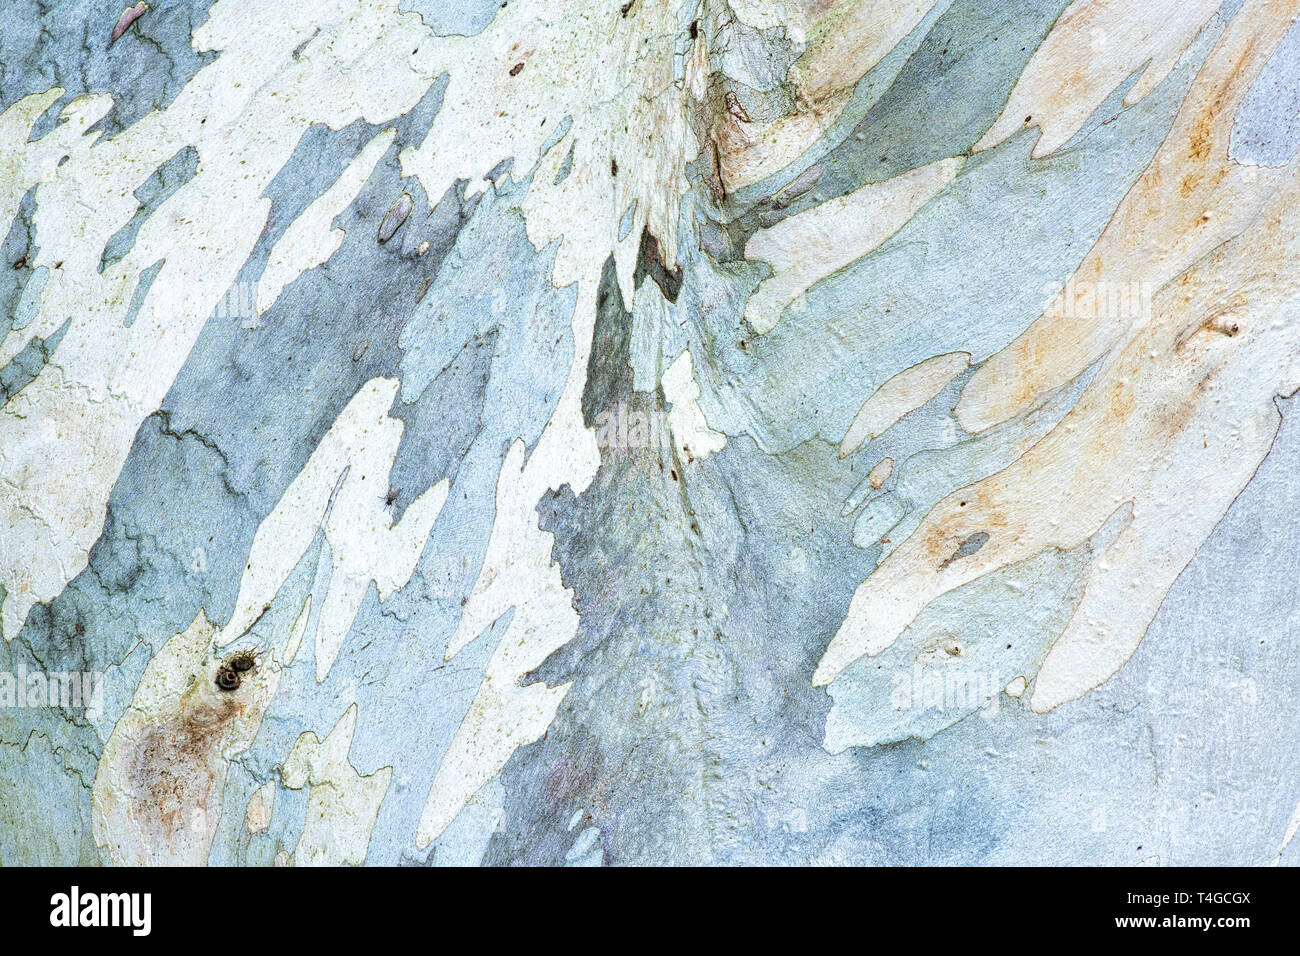 Eucalyptus pauciflora niphophila. Alpine snow gum tree bark - Stock Image